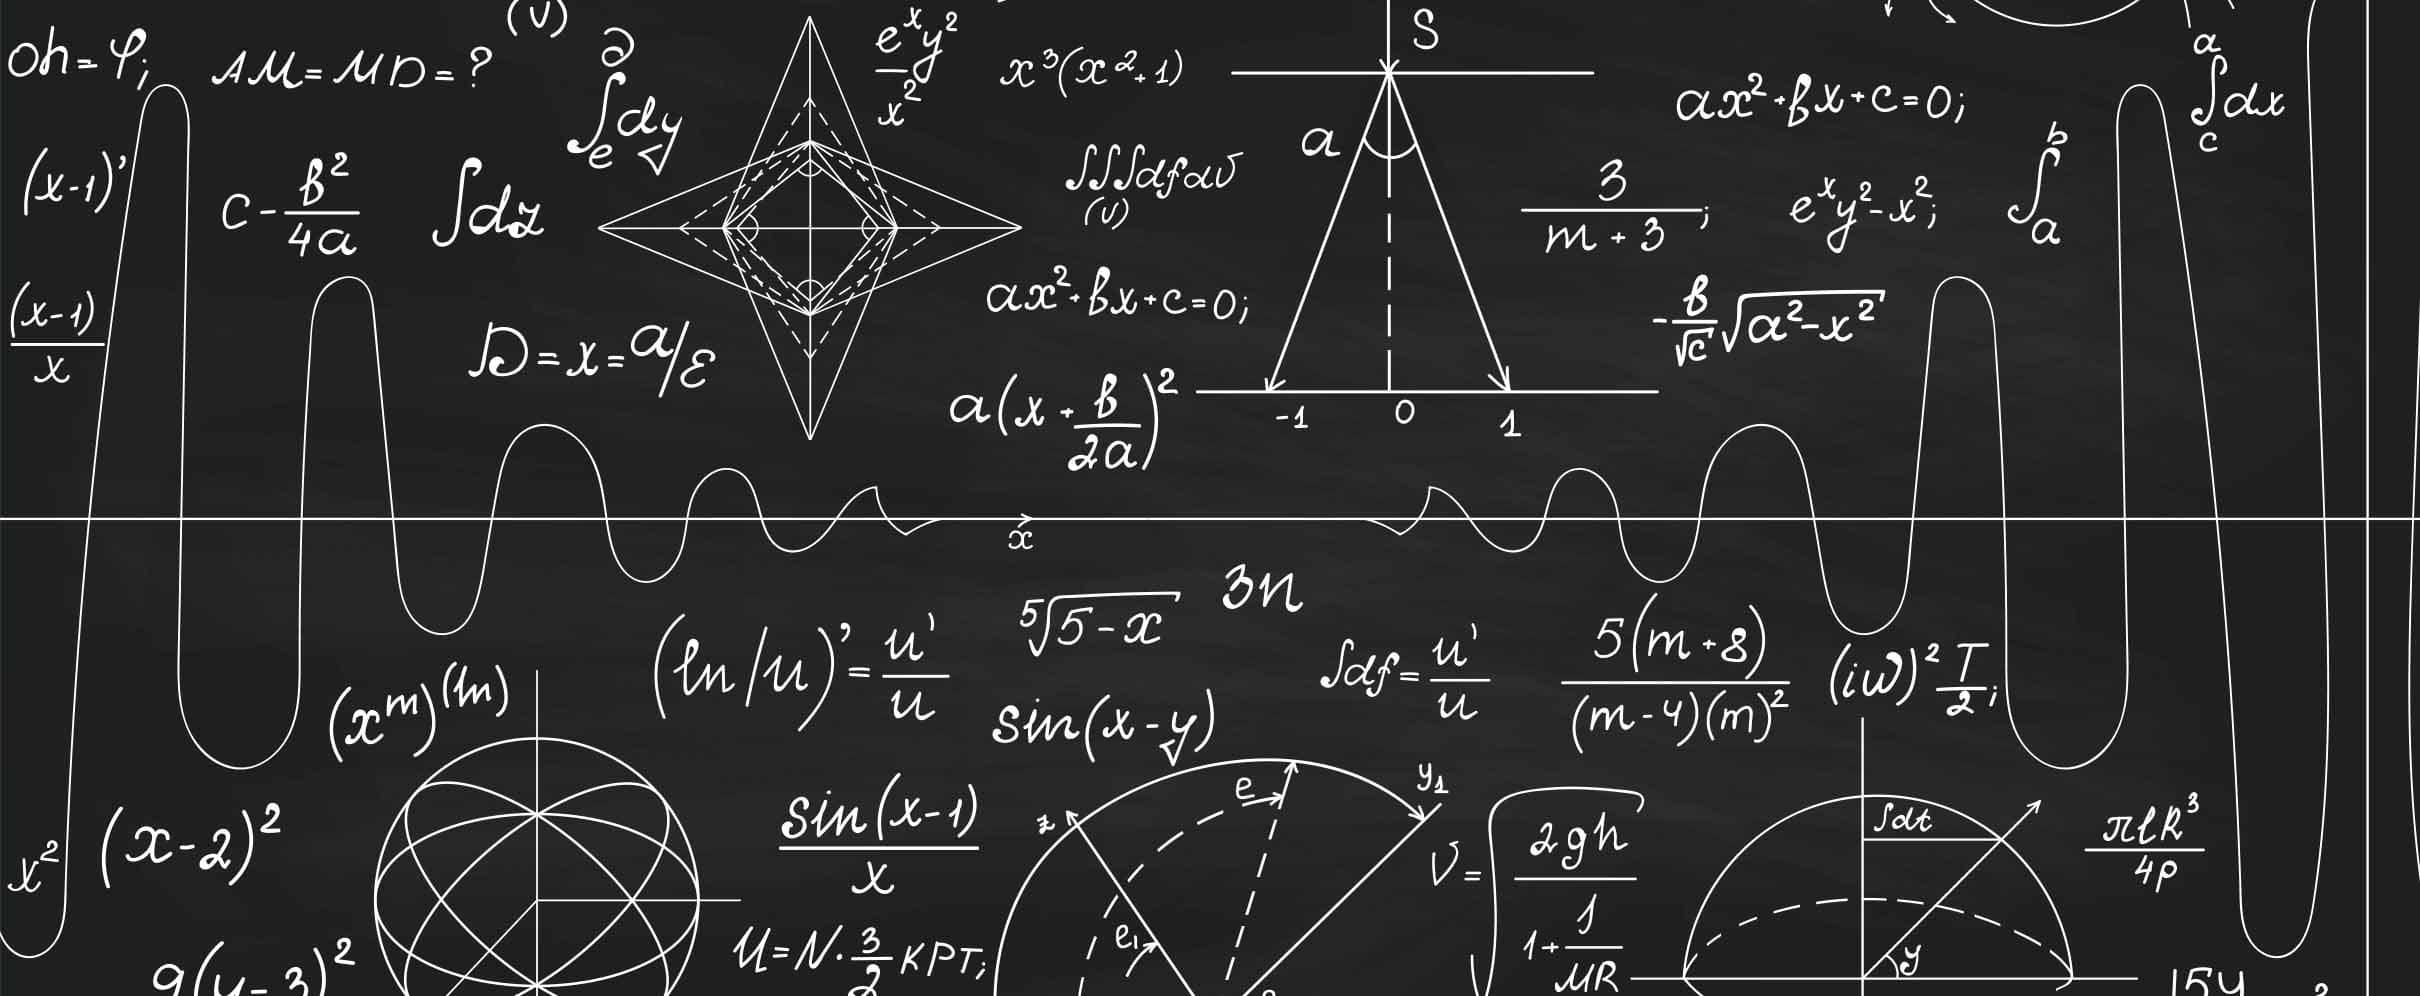 Formulas written in white on a black background.